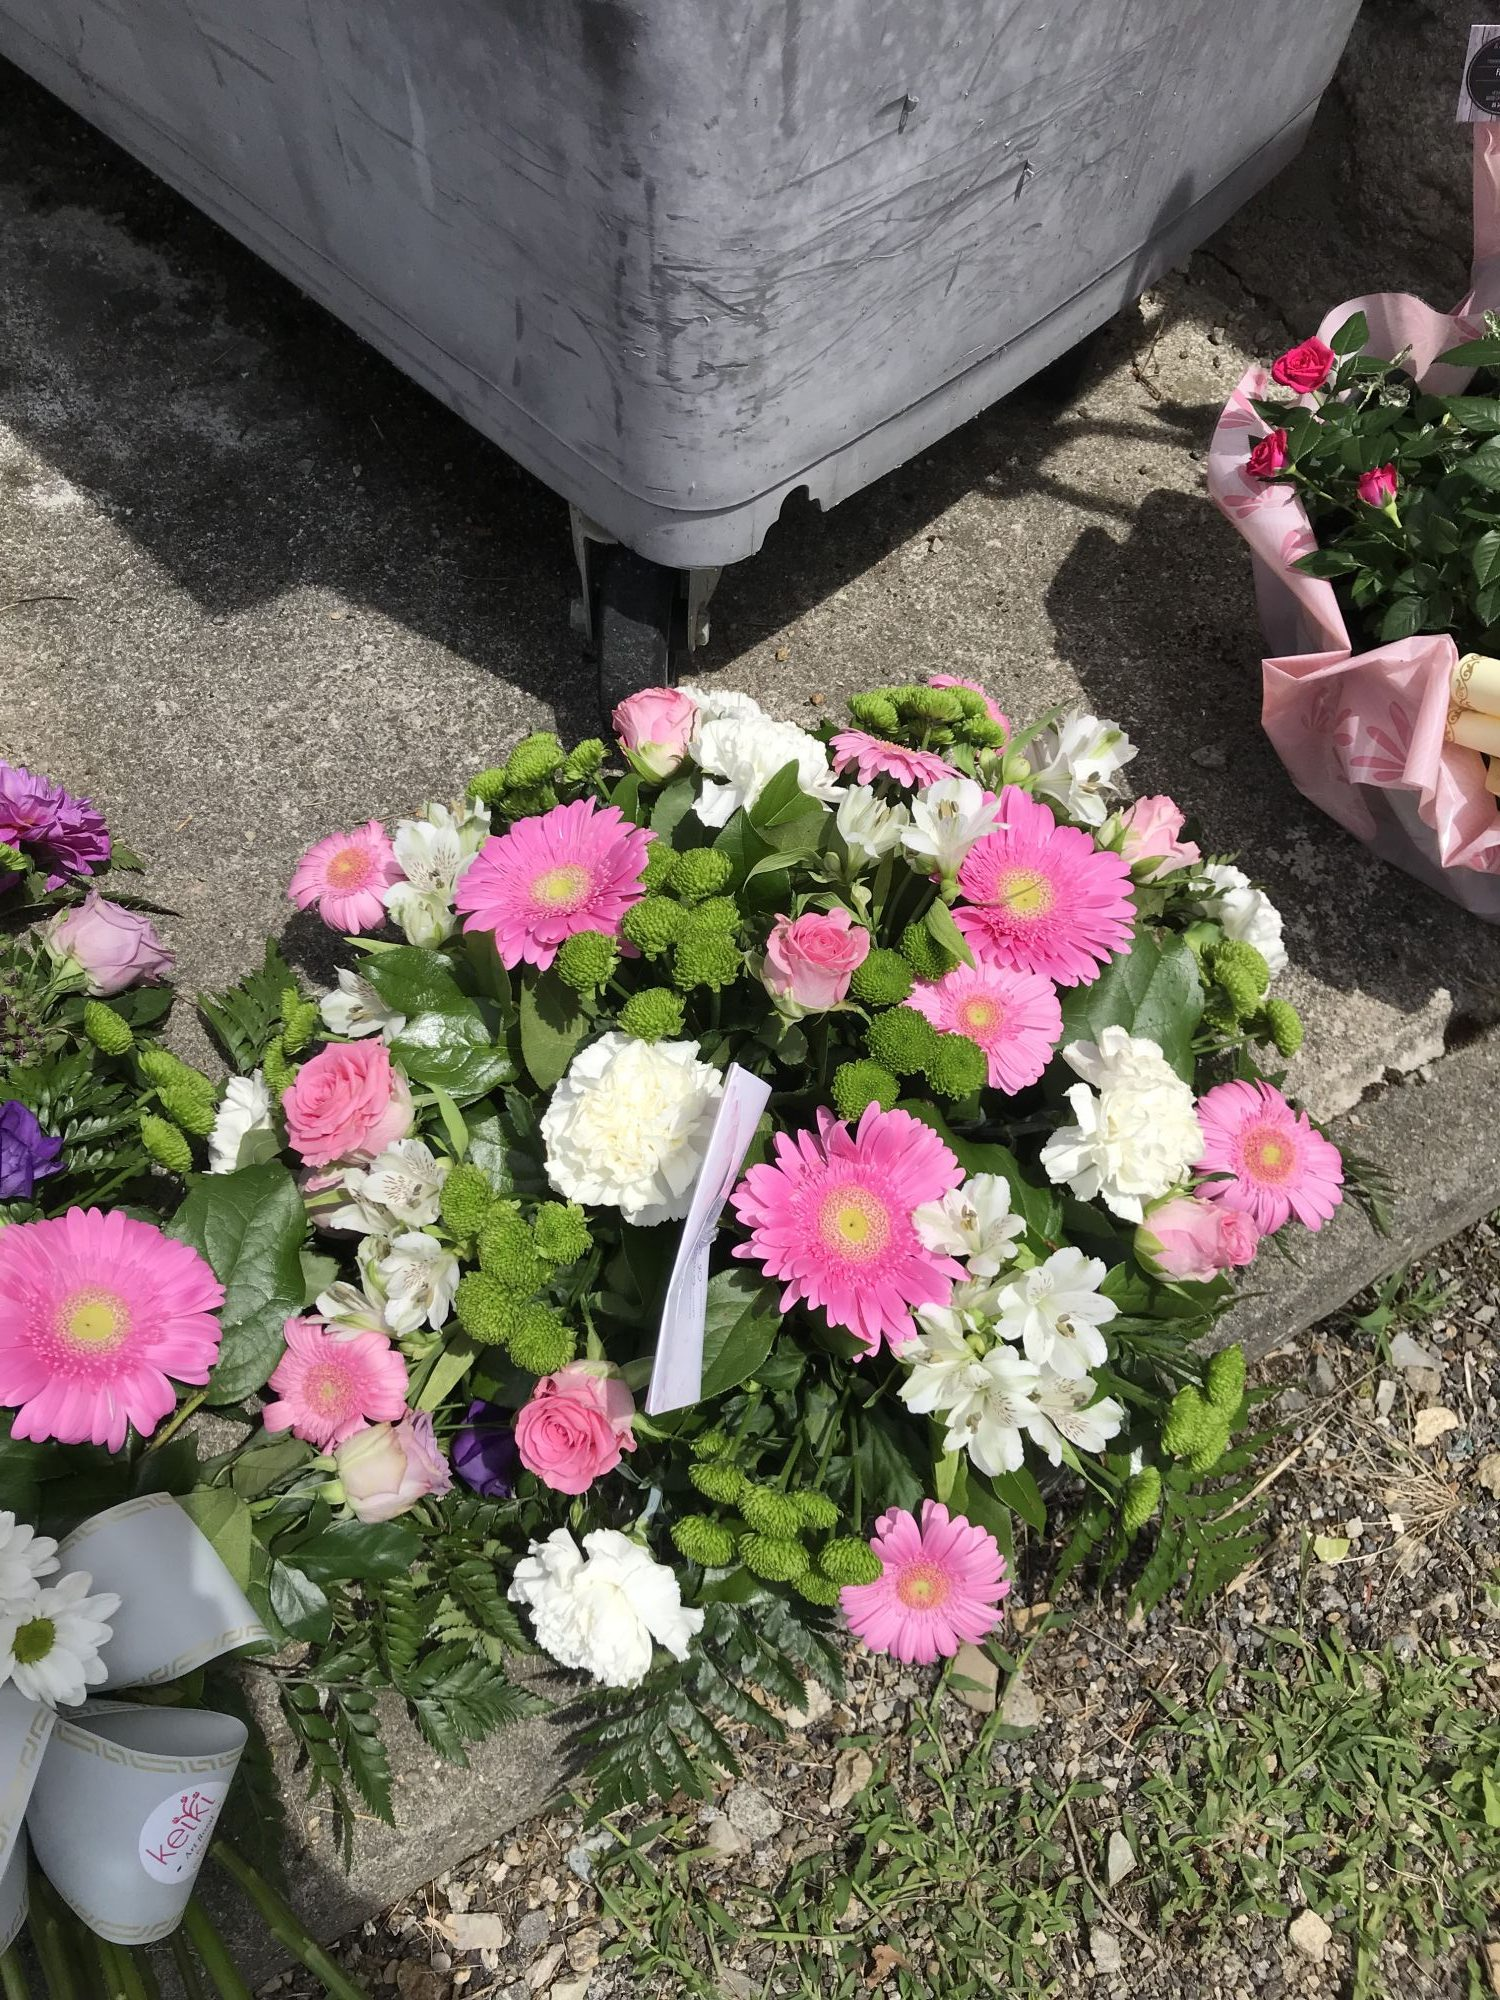 deuil-gerbe-de-fleurs-gerbera-rose-et-blanc